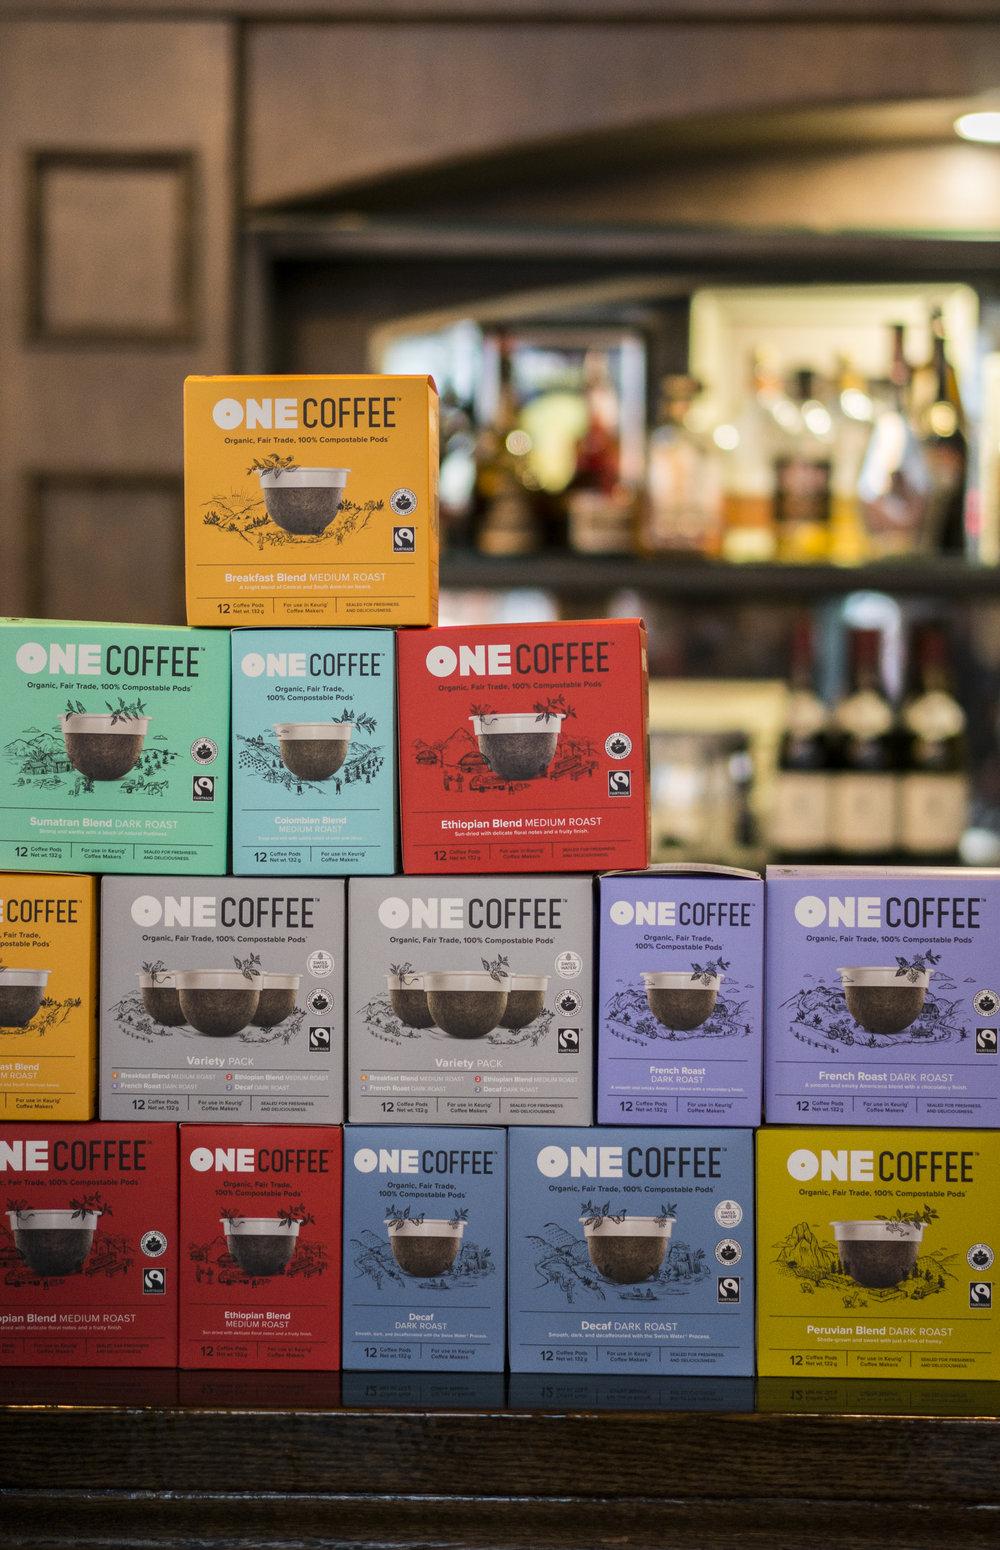 onecoffee_medina.1001.jpg